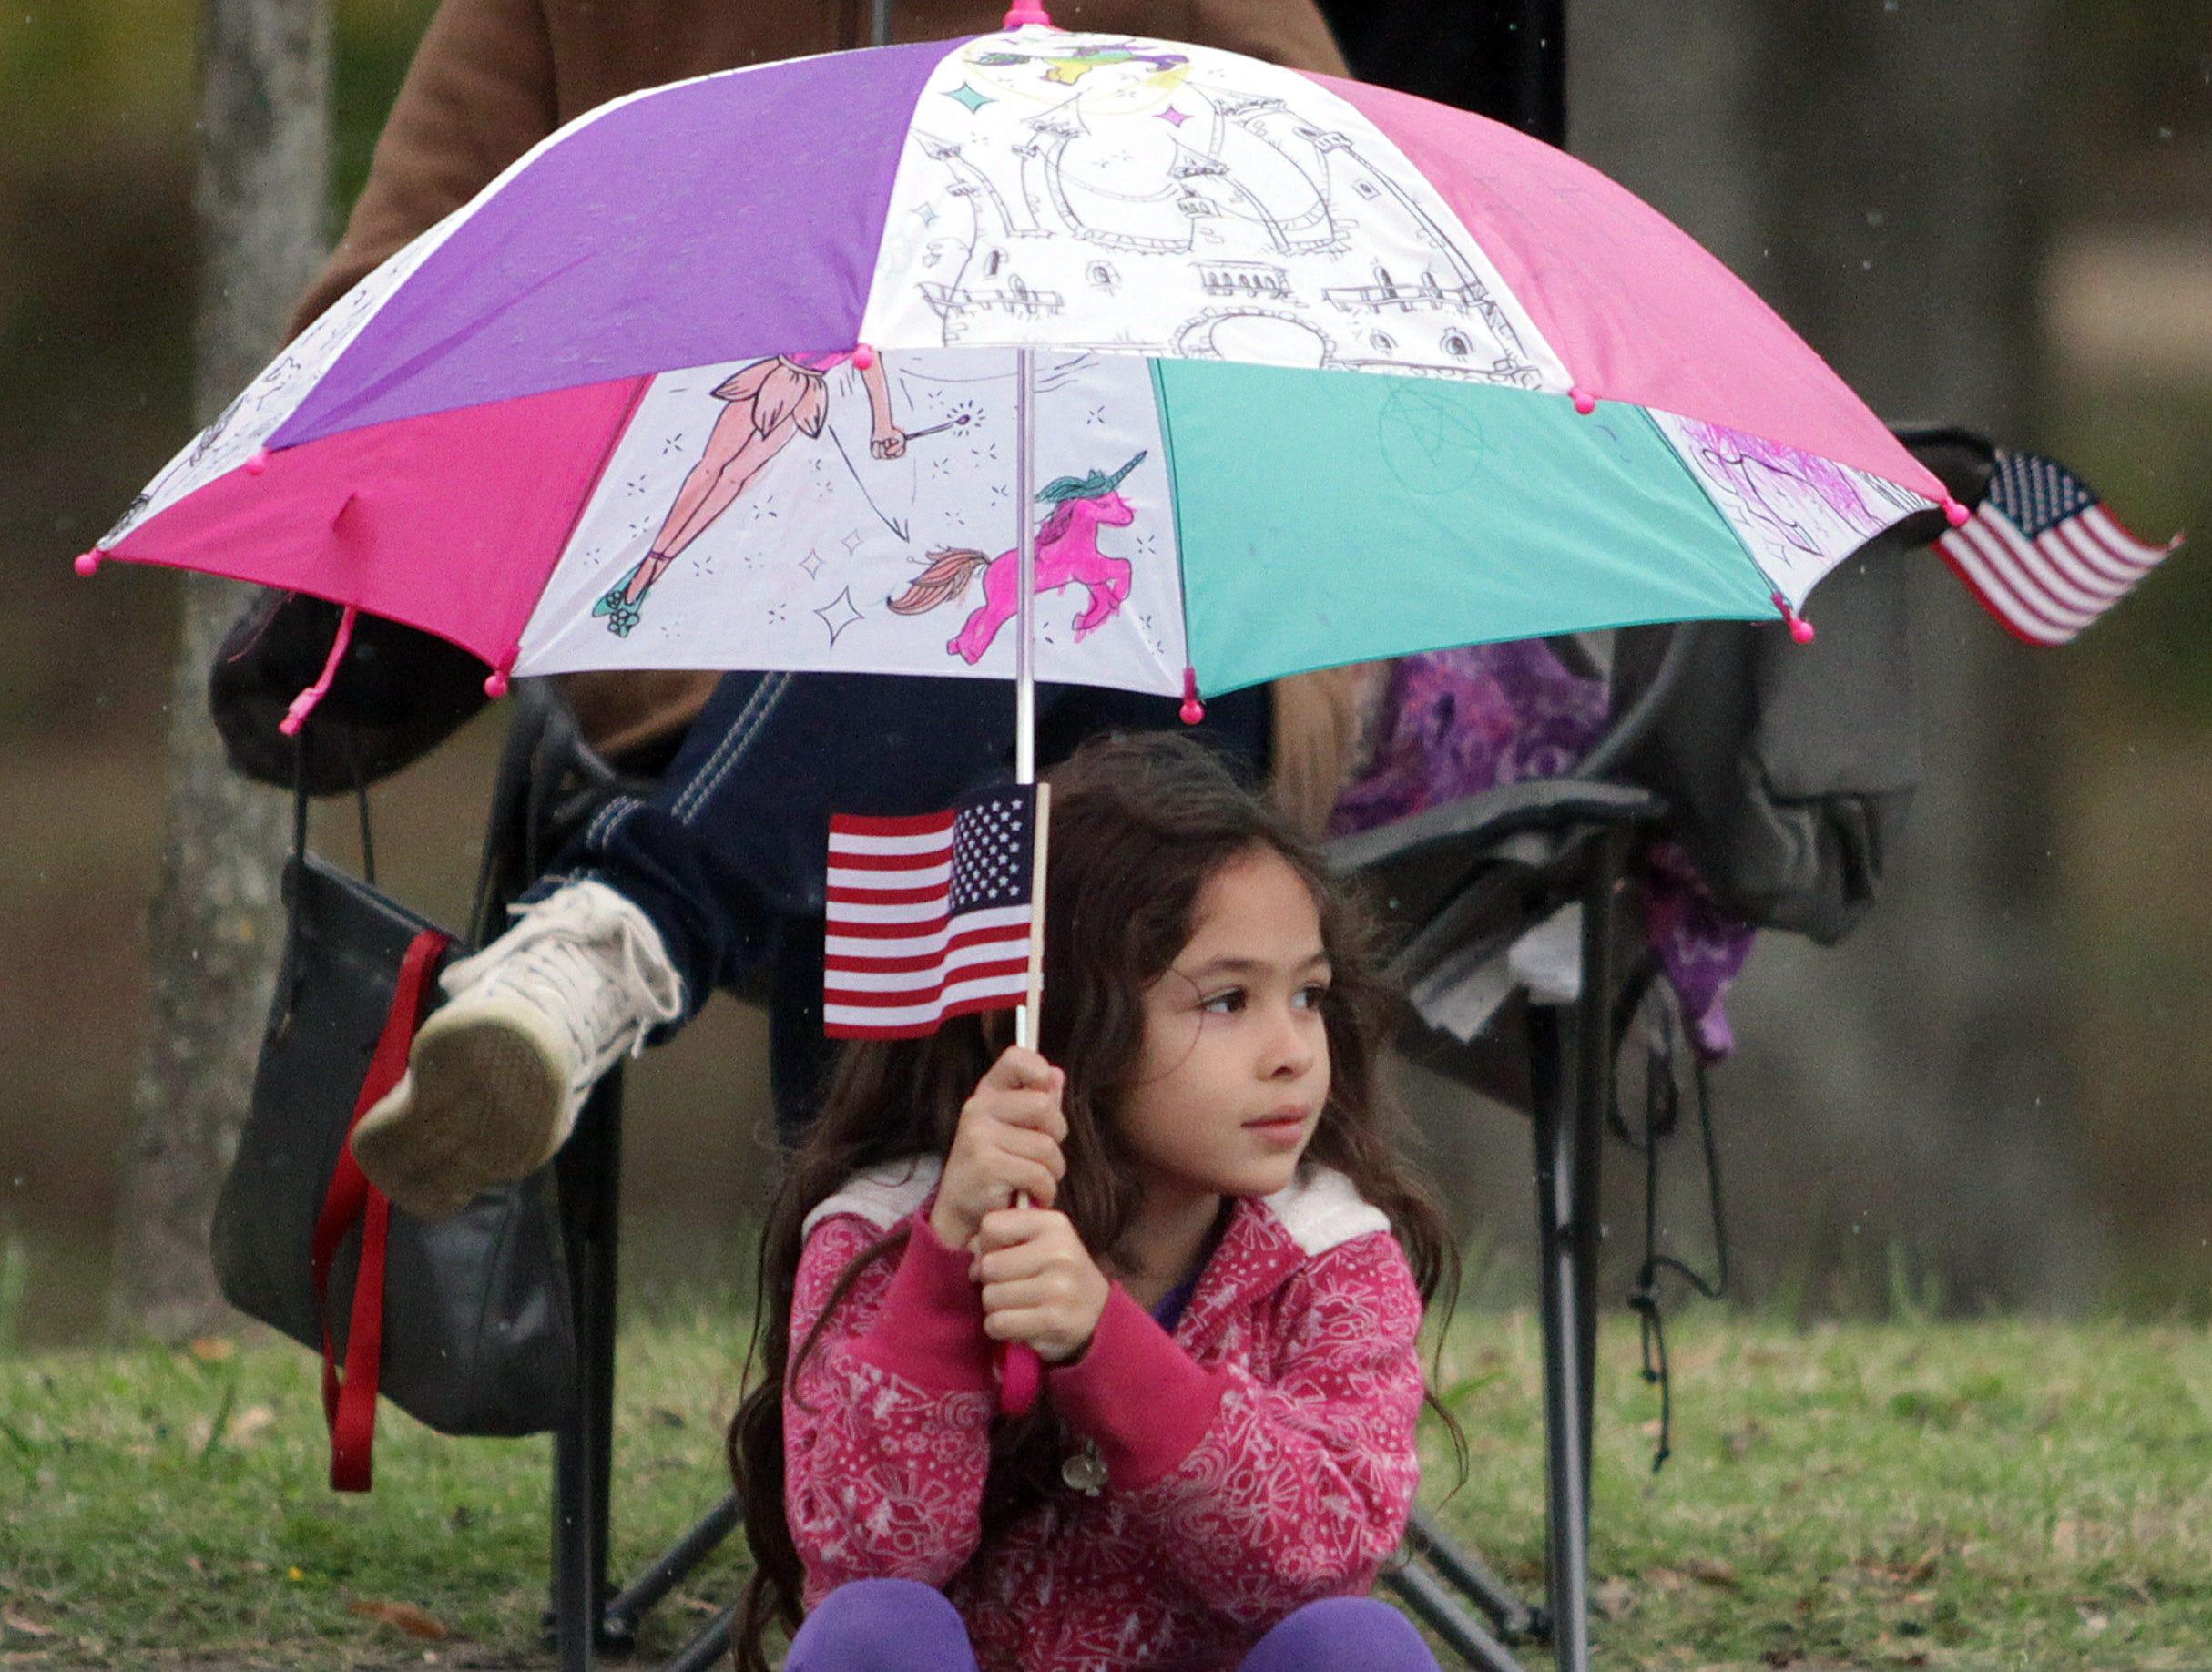 Alexandria Alba (7) watches the Veterans Day Parade in Hendersonville, TN on Sunday, November 4, 2018.